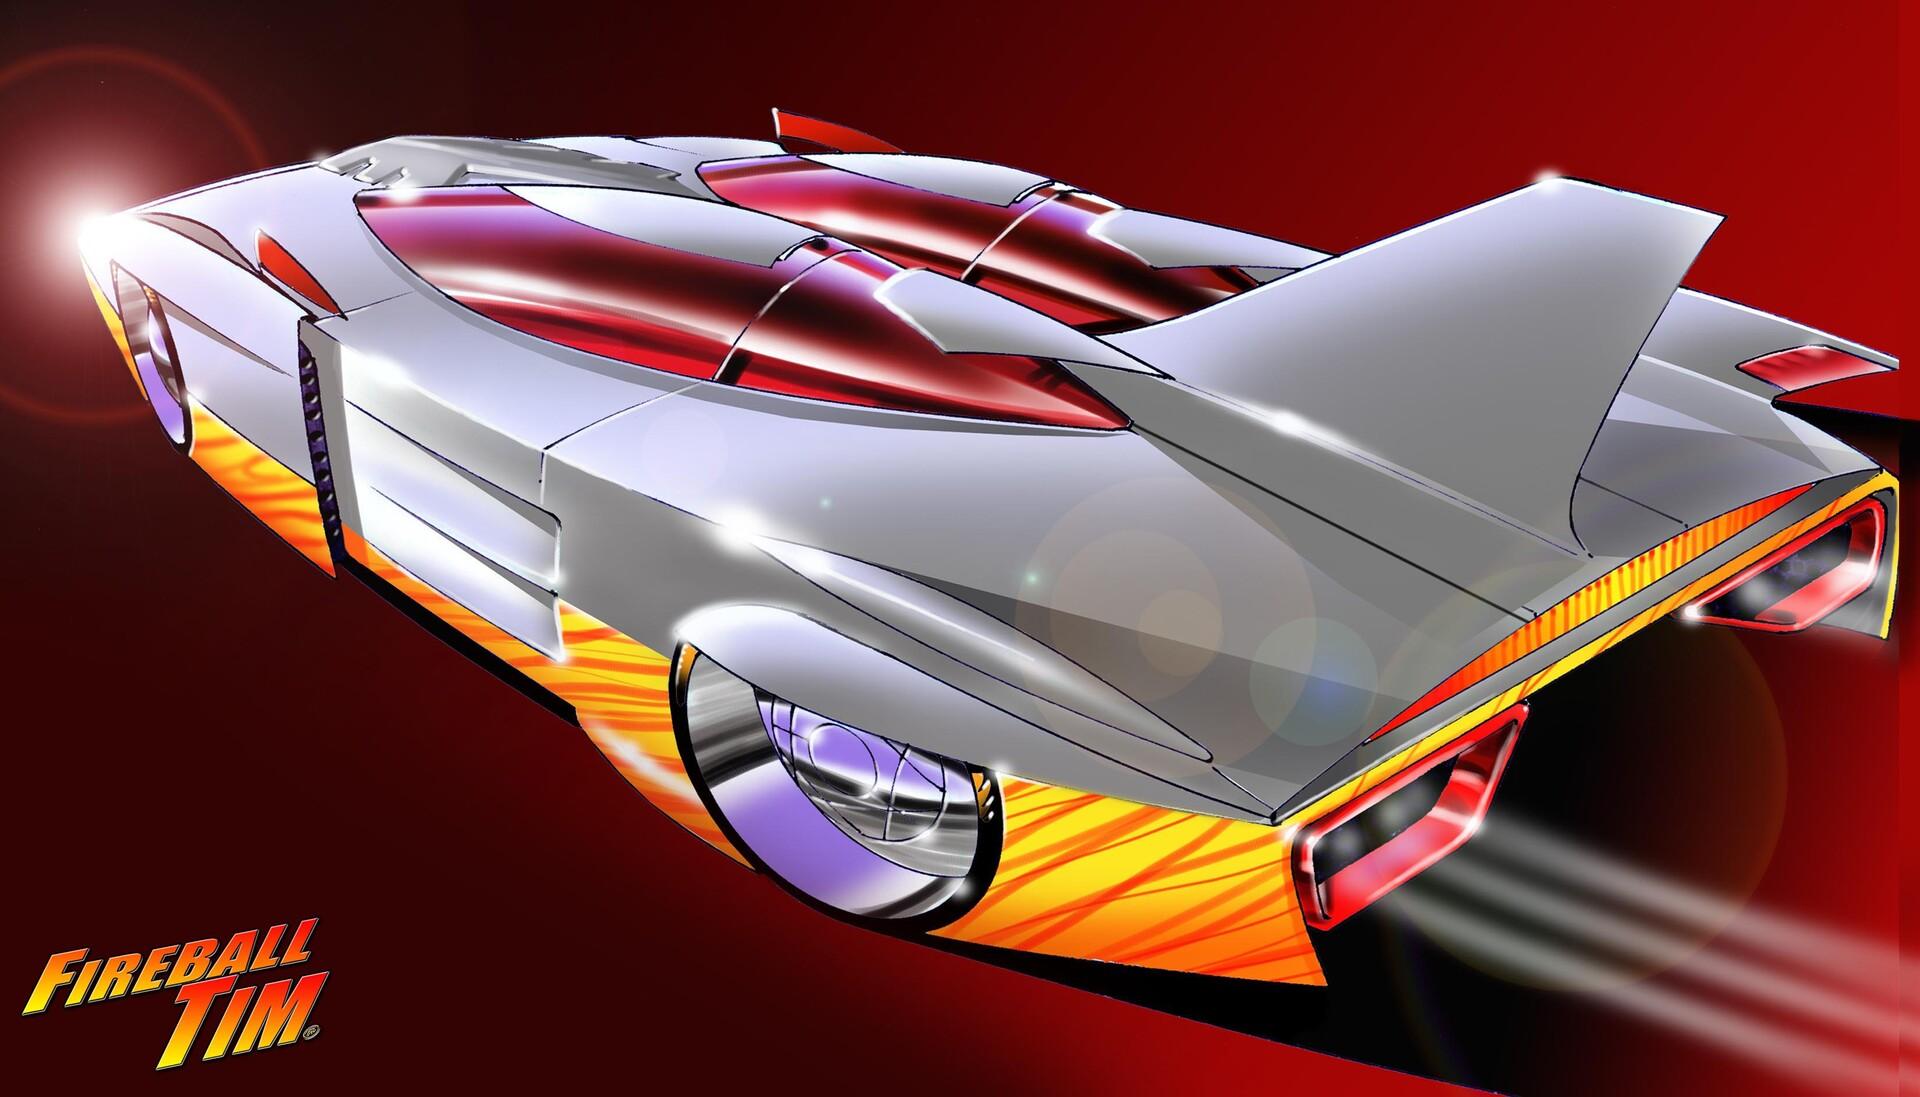 FIREBIRD 3 CONCEPT - Client - General Motors